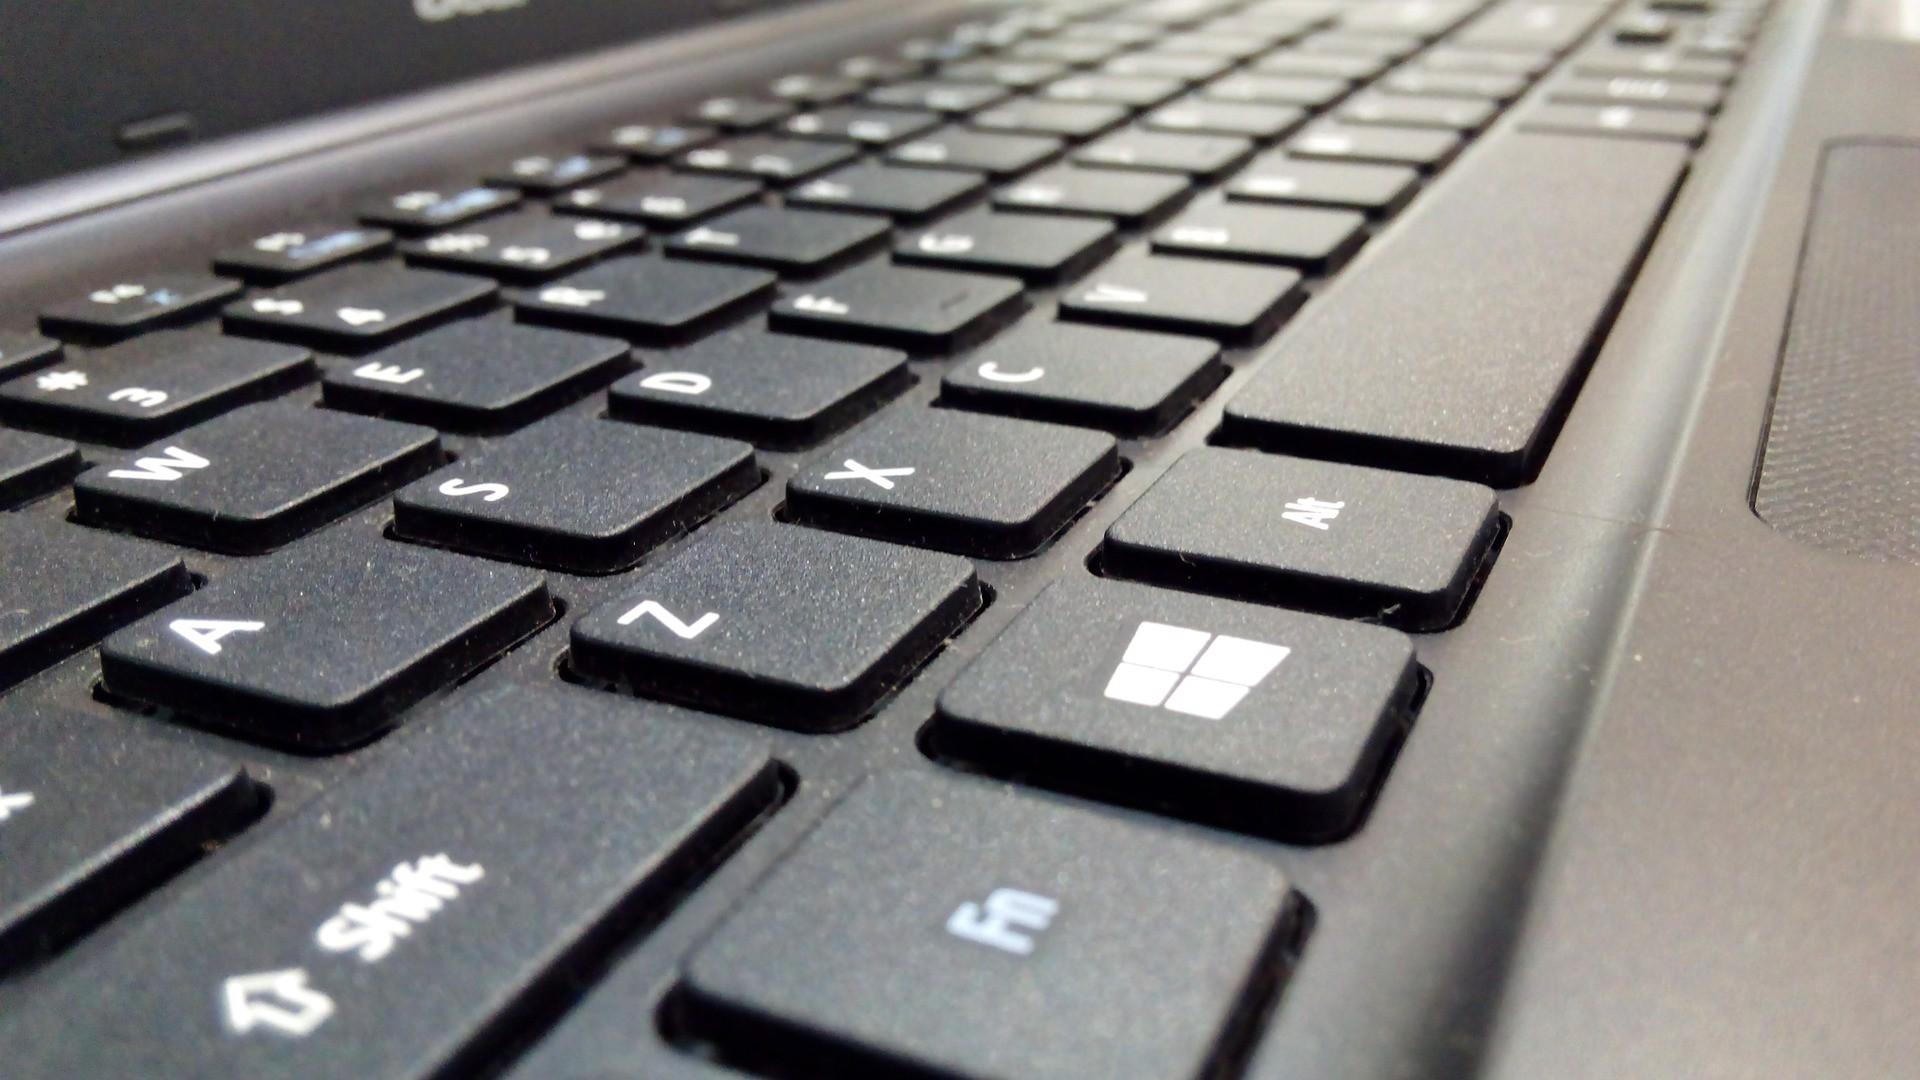 Office 365: Umfassende Phishing-Attacke auf Administratoren